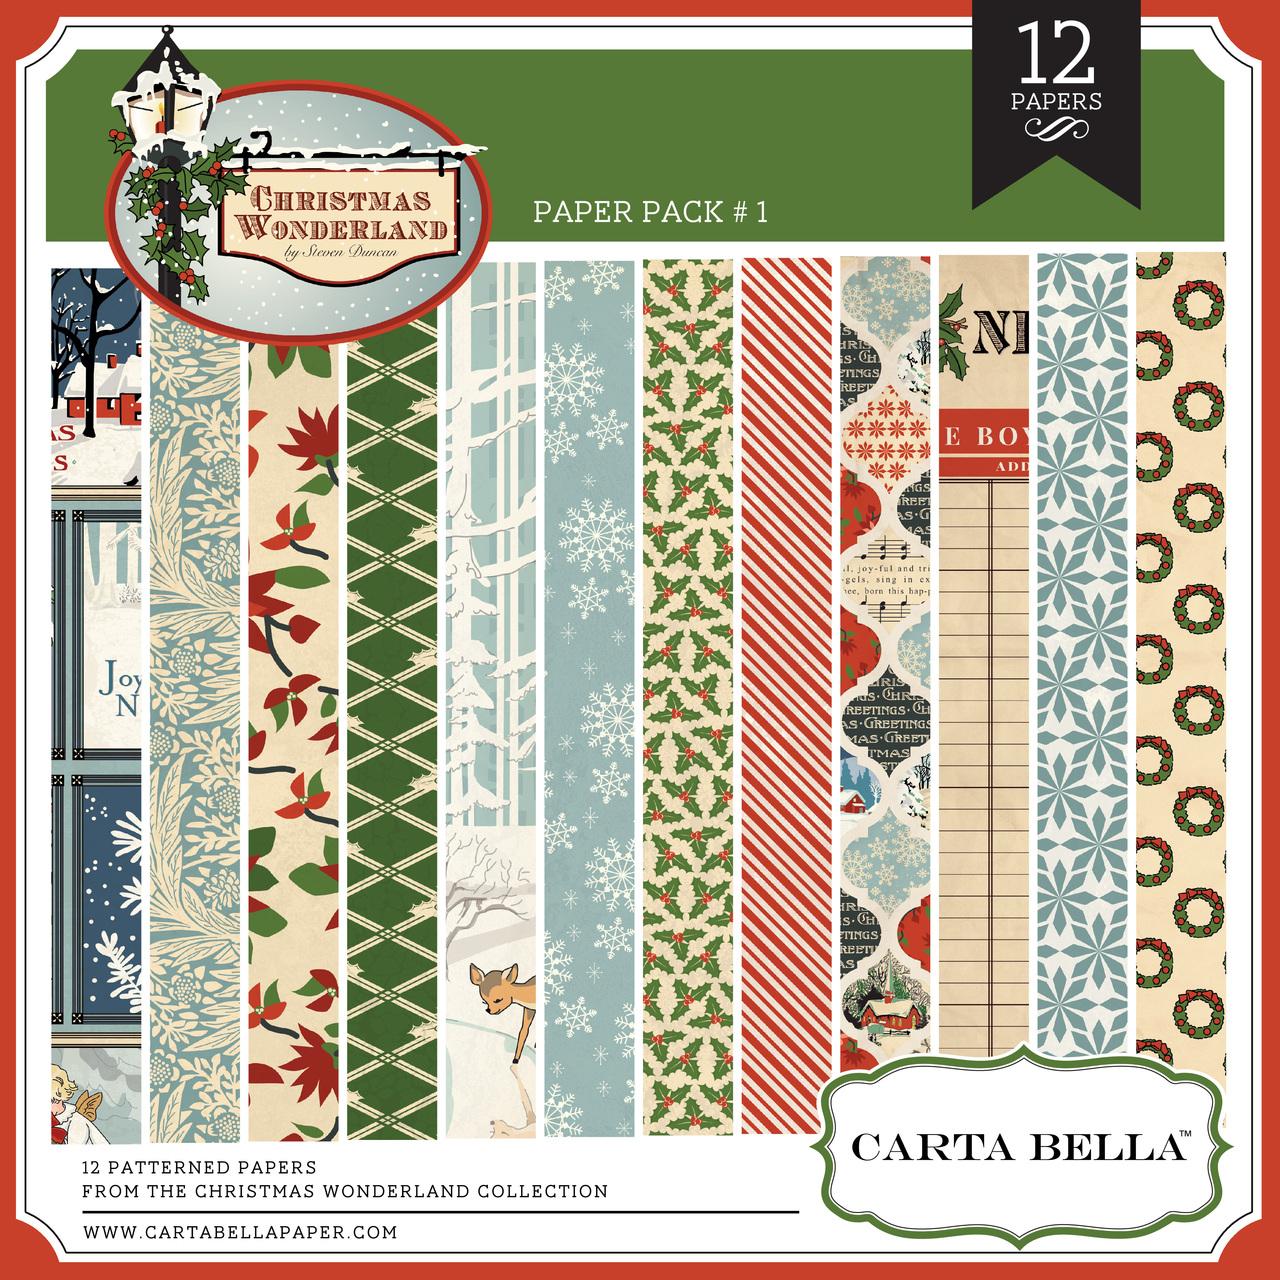 Christmas Wonderland Paper Pack 1